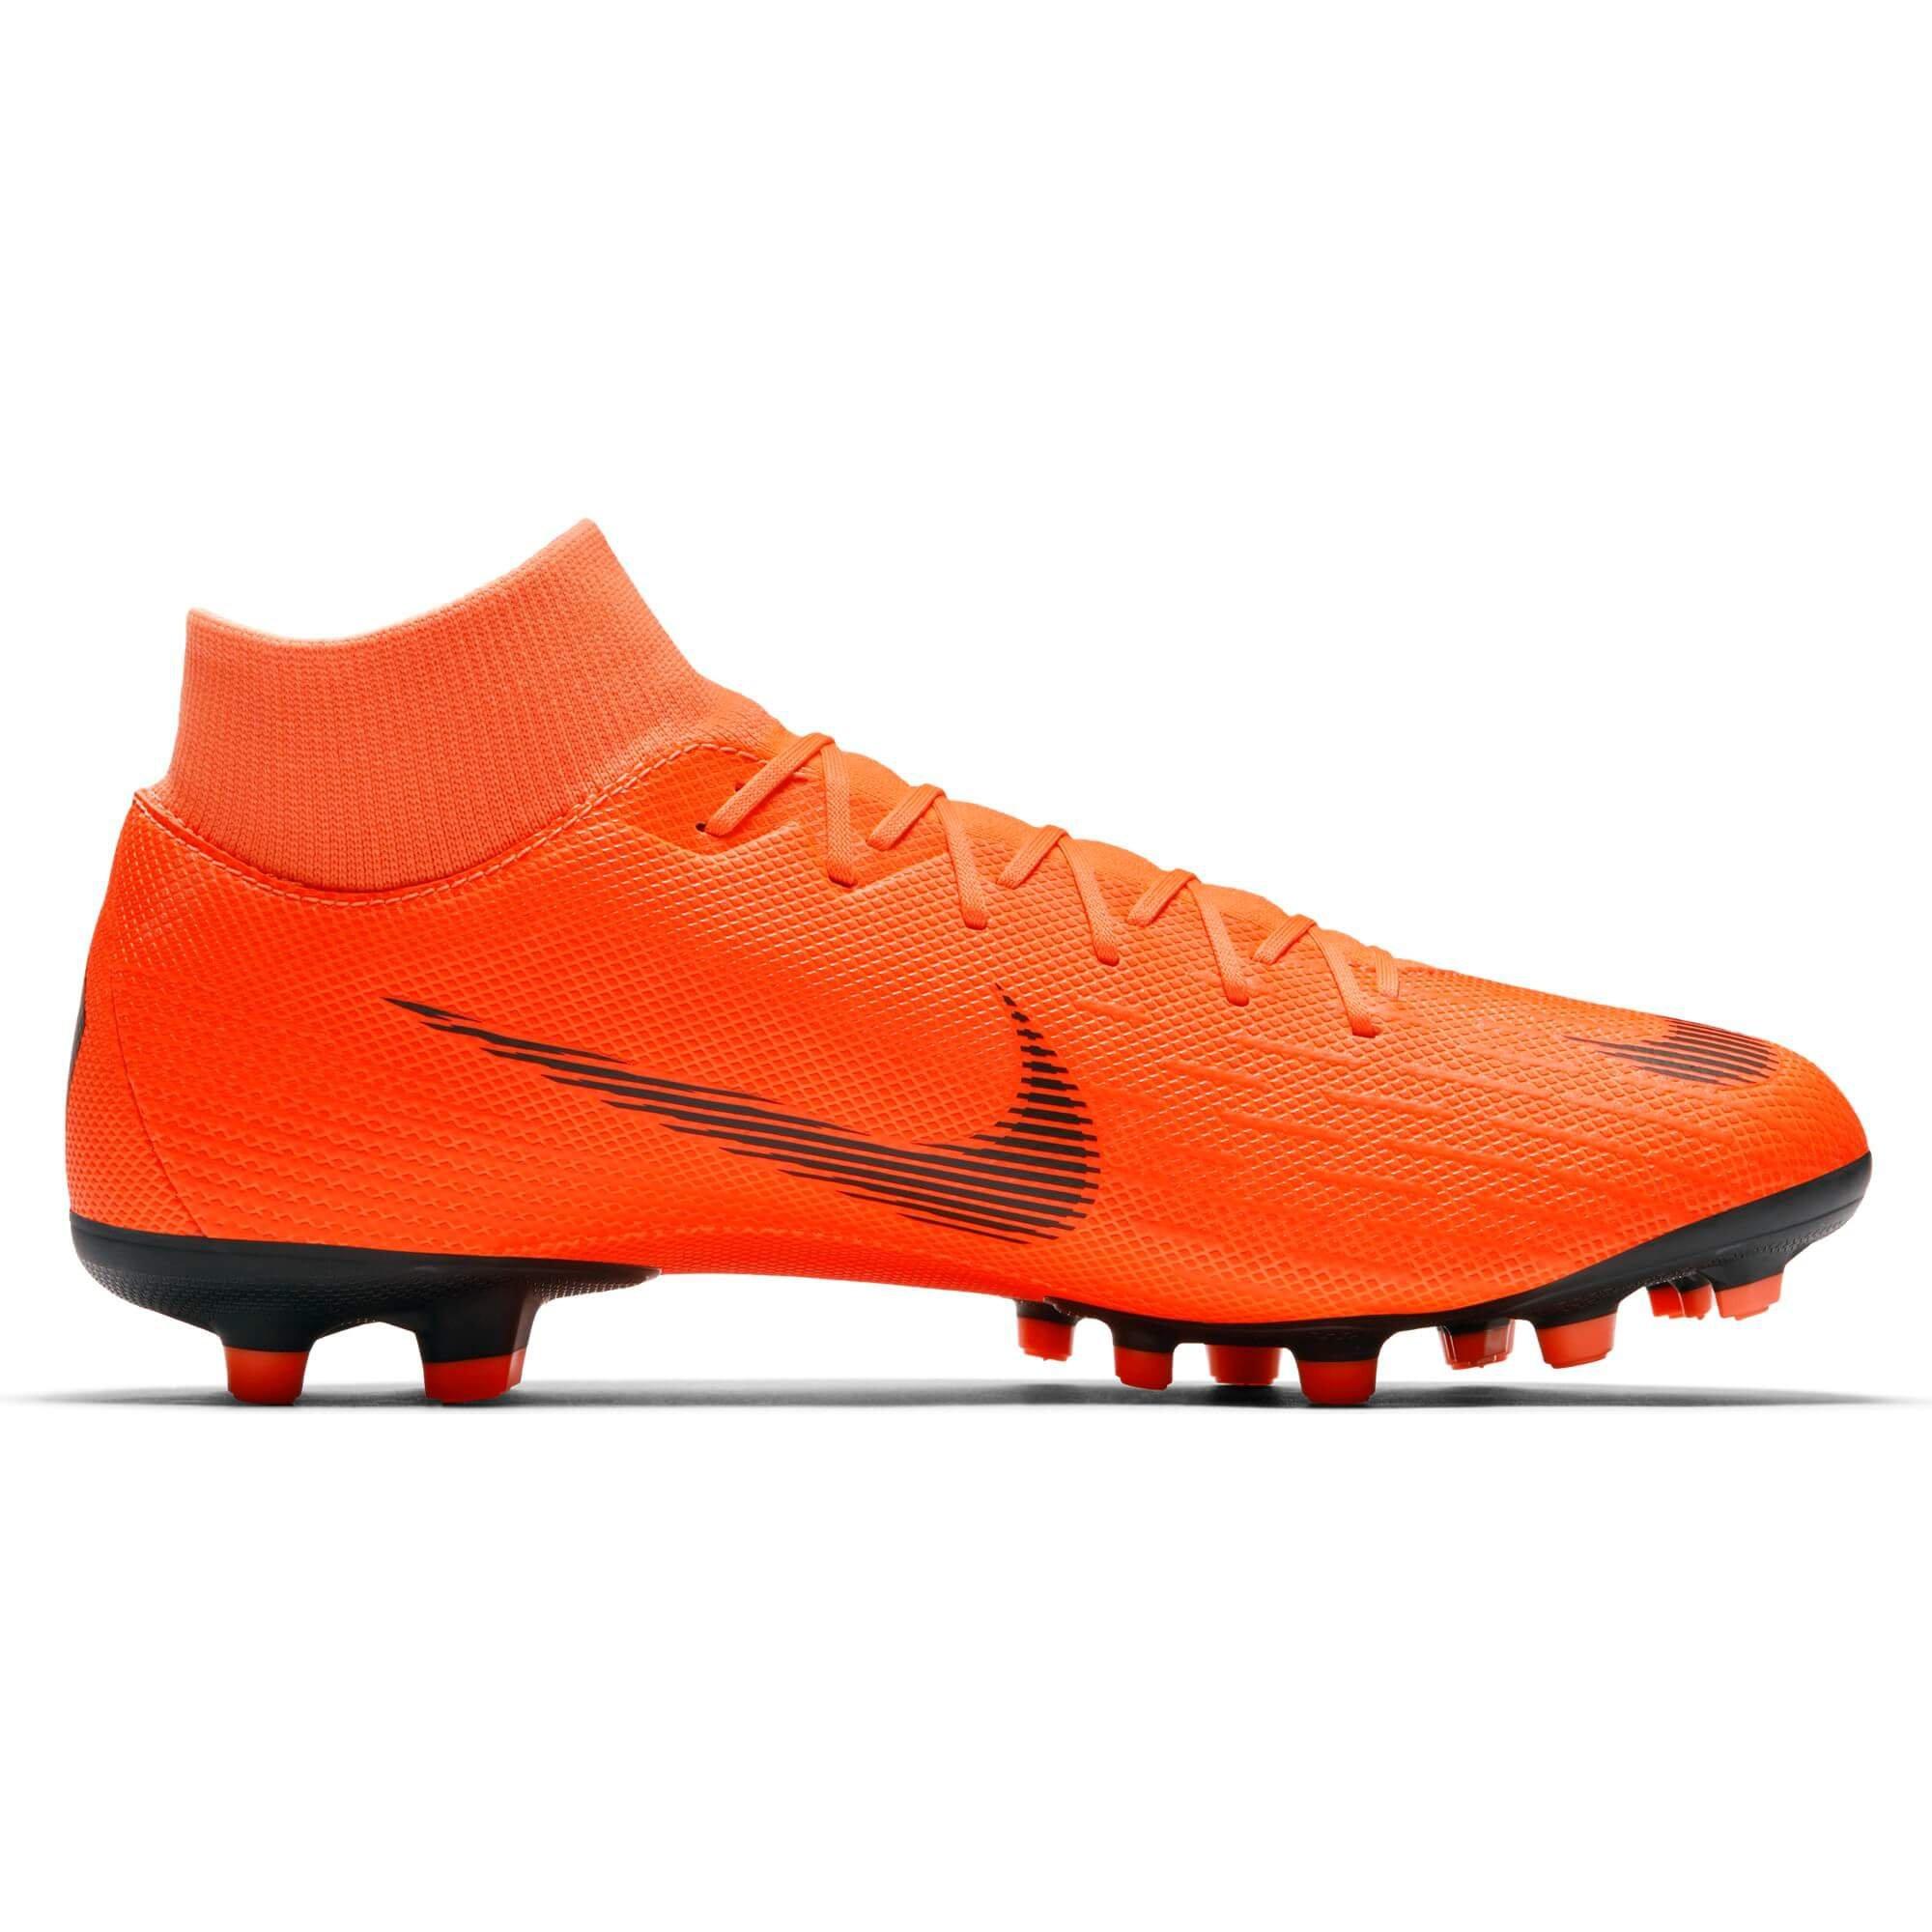 sale retailer d3618 22882 purchase chaussures de football chaussures football nike mercurial superfly  360 vi b5fb9 400bb  reduced nike mercurial superfly 6 aca mg orange noir  b388d ...